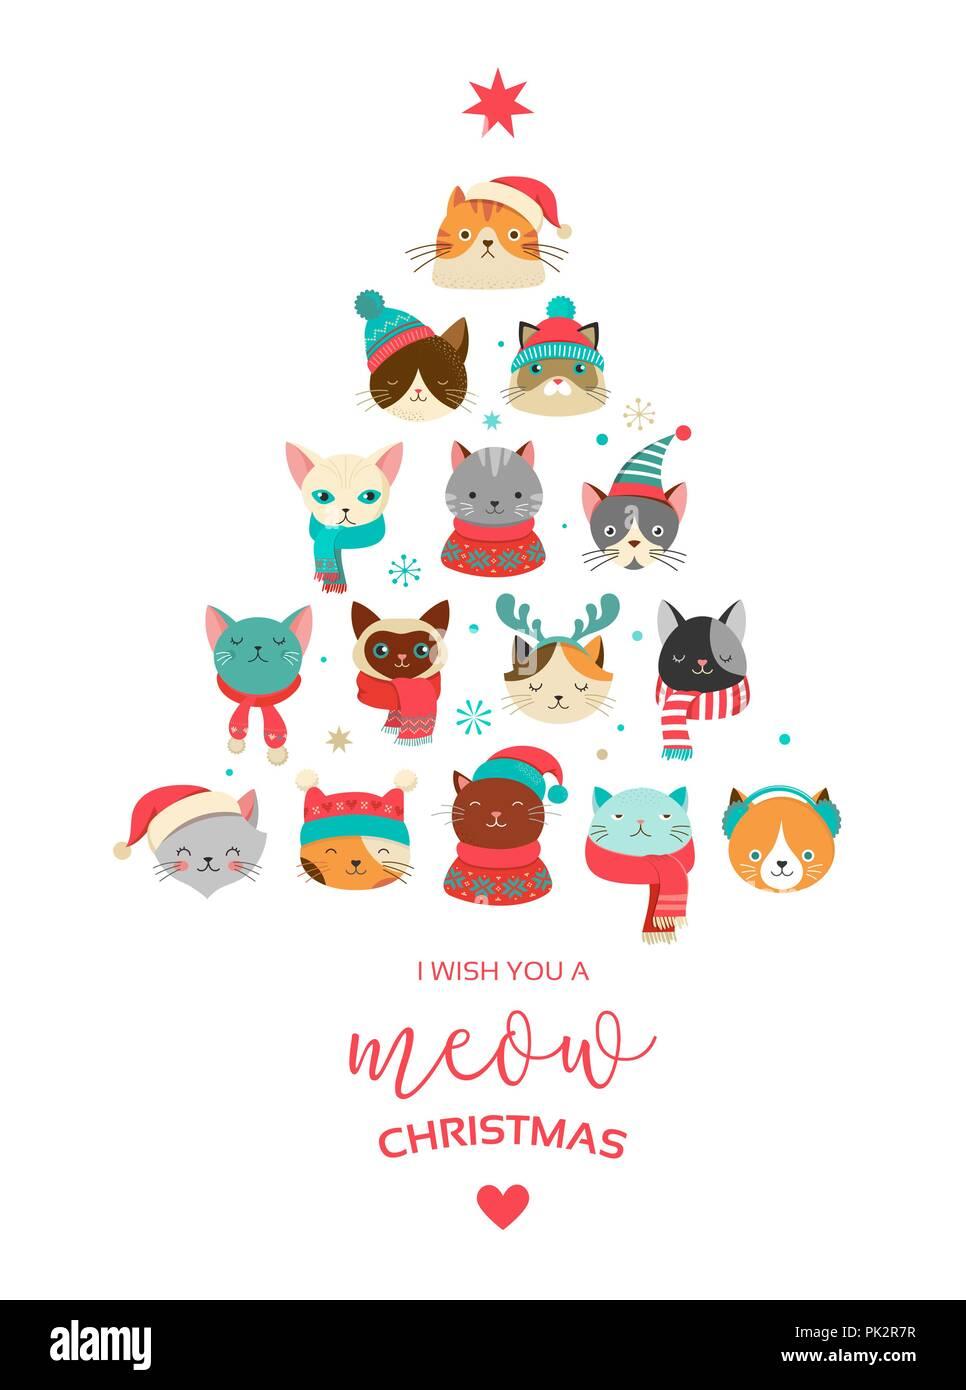 Merry Christmas Animals.Xmas Animals Stock Photos Xmas Animals Stock Images Alamy